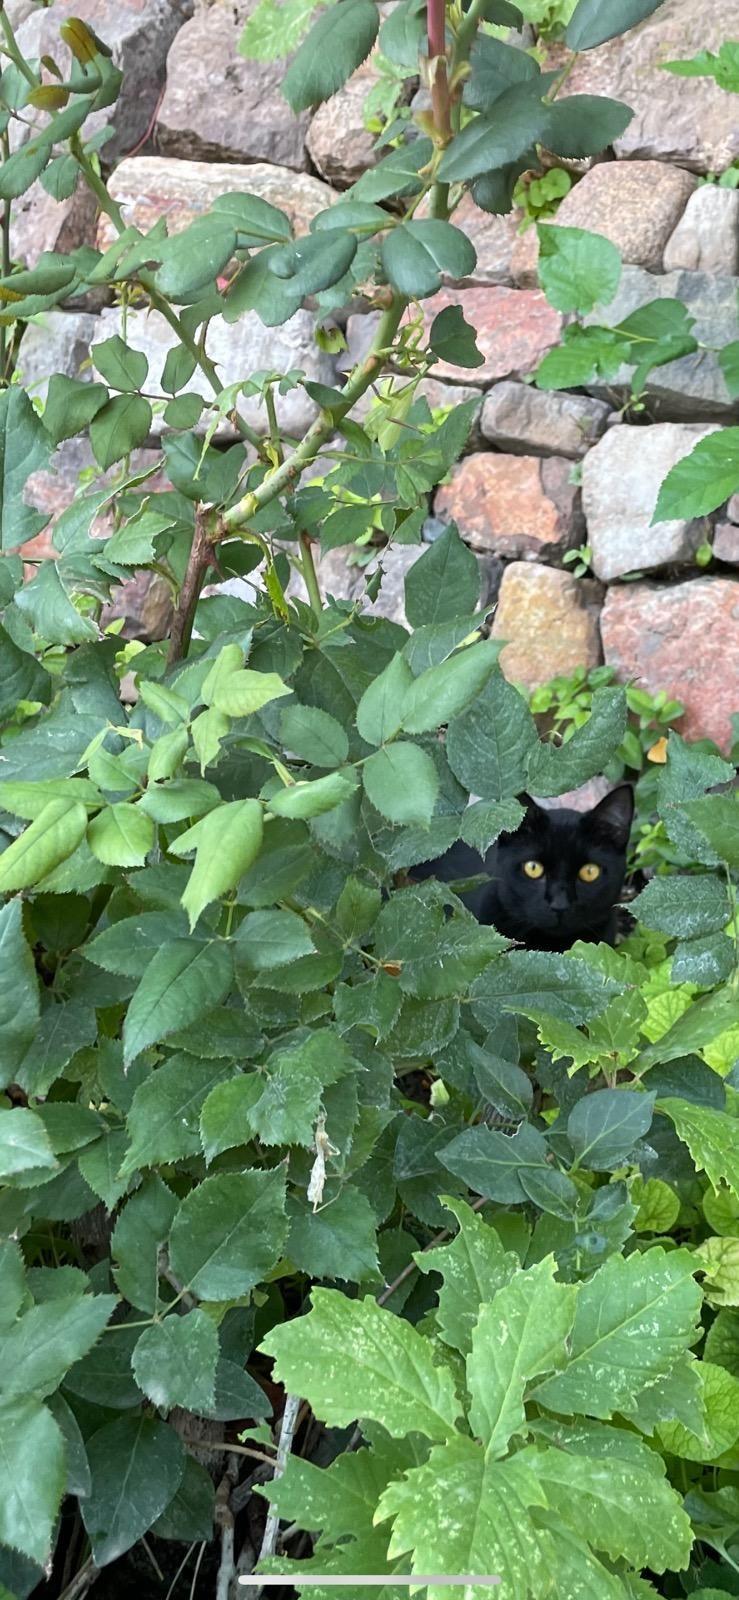 Little kitty visitor